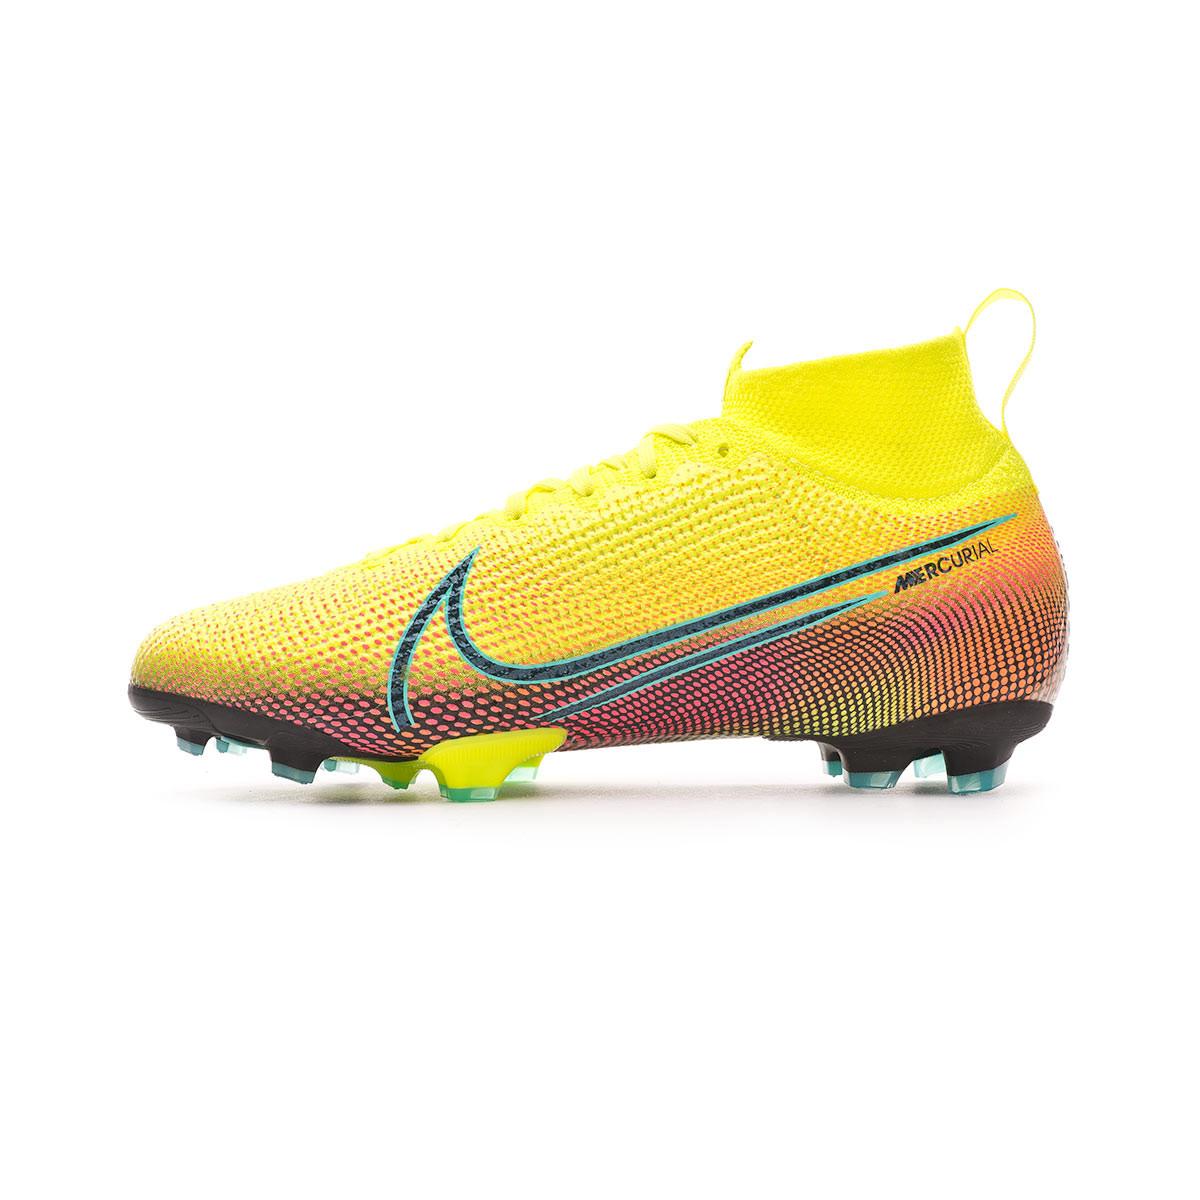 Chaussure de foot Nike Mercurial Superfly VII Elite MDS FG Enfant